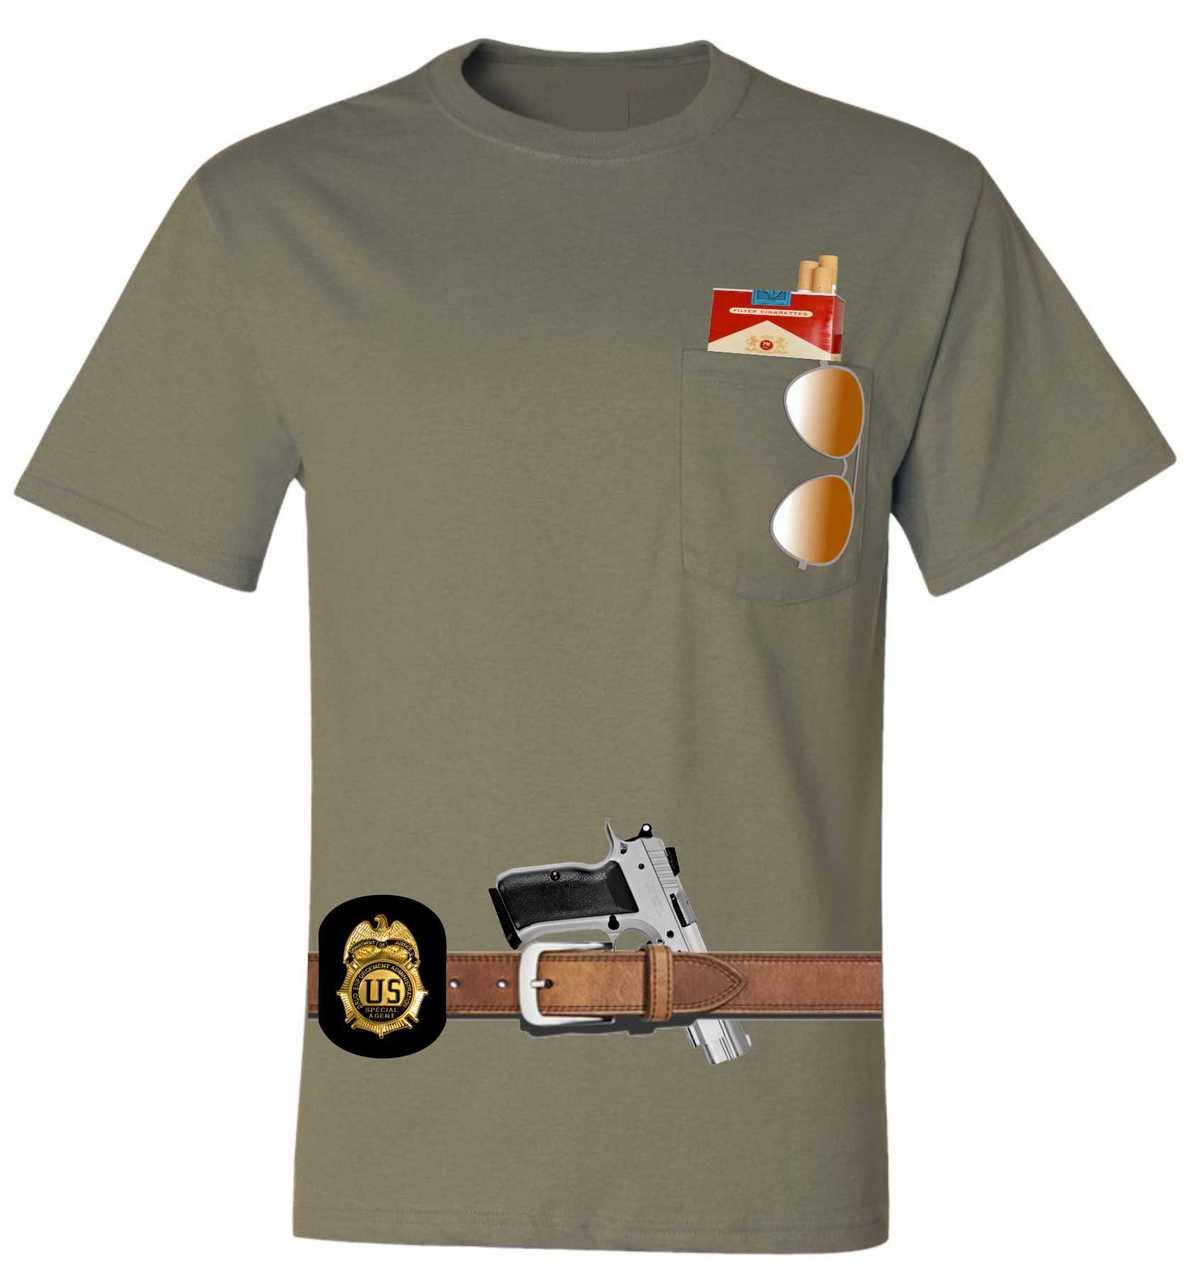 Halloween Shirt Ideas.Adult Pocket T Shirt Javier Pena Costume Best Halloween Ideas